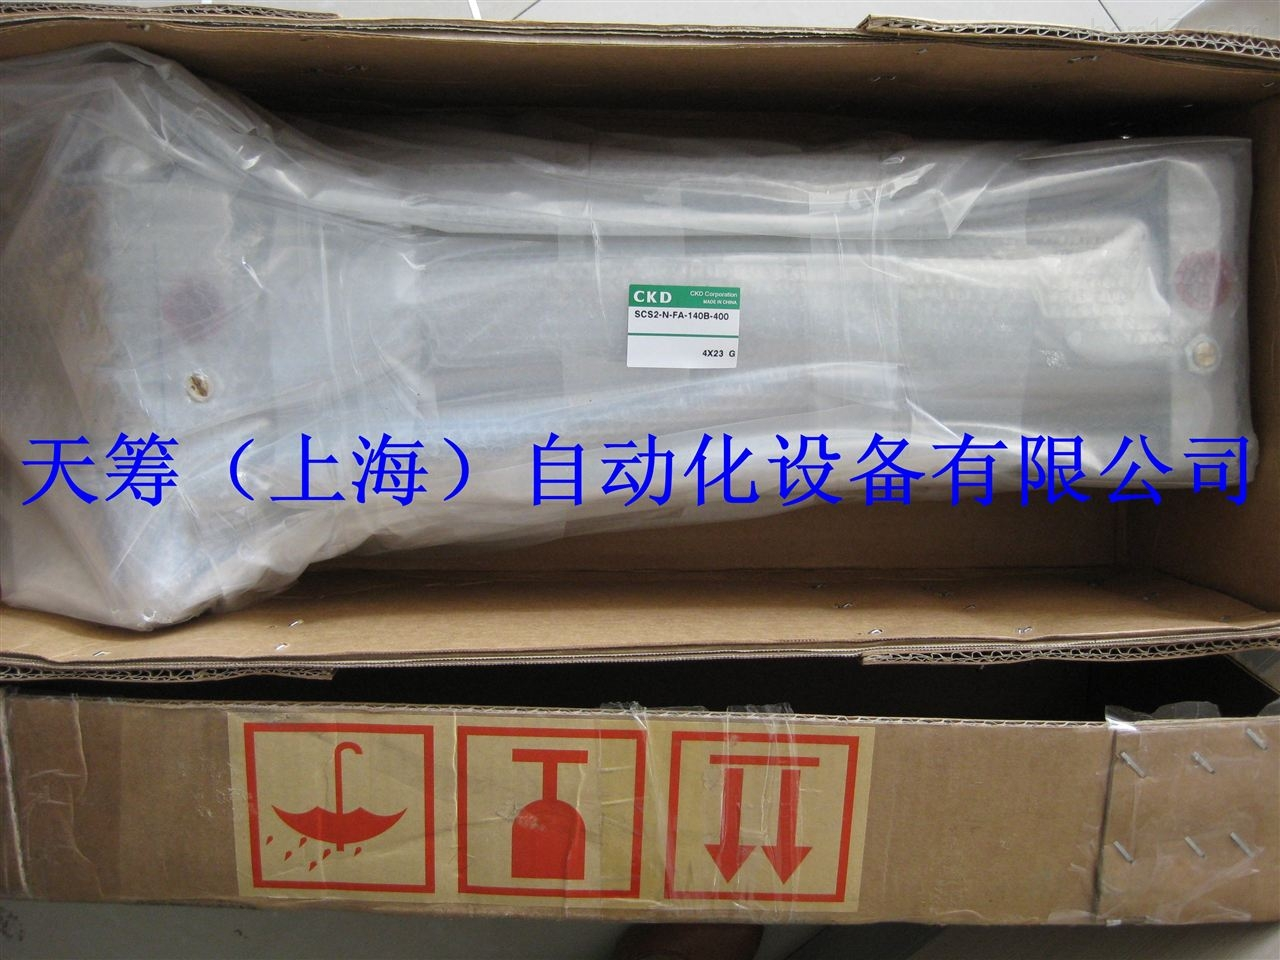 CKD气缸SCS2-N-FA-140B-400